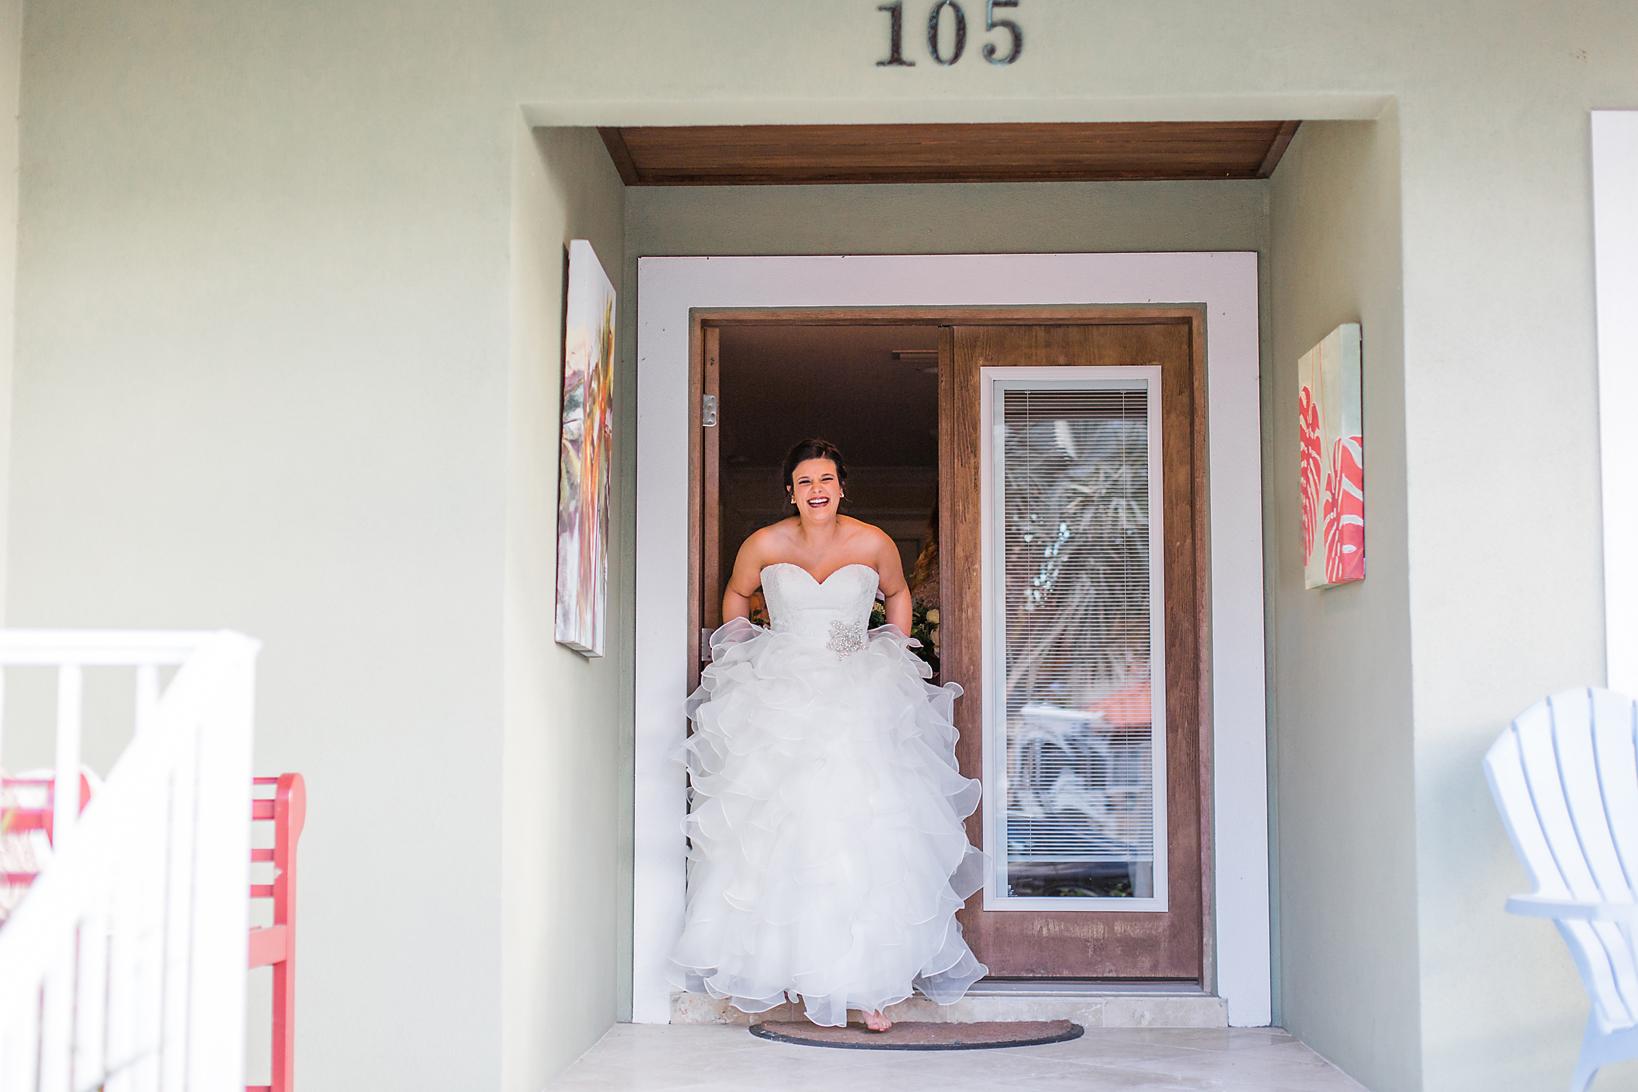 Bailey + Chalin - Anna Maria Island Wedding Photographer - Destination Wedding Photography - Emily & Co. Photography - Beach Wedding Photography (17).jpg